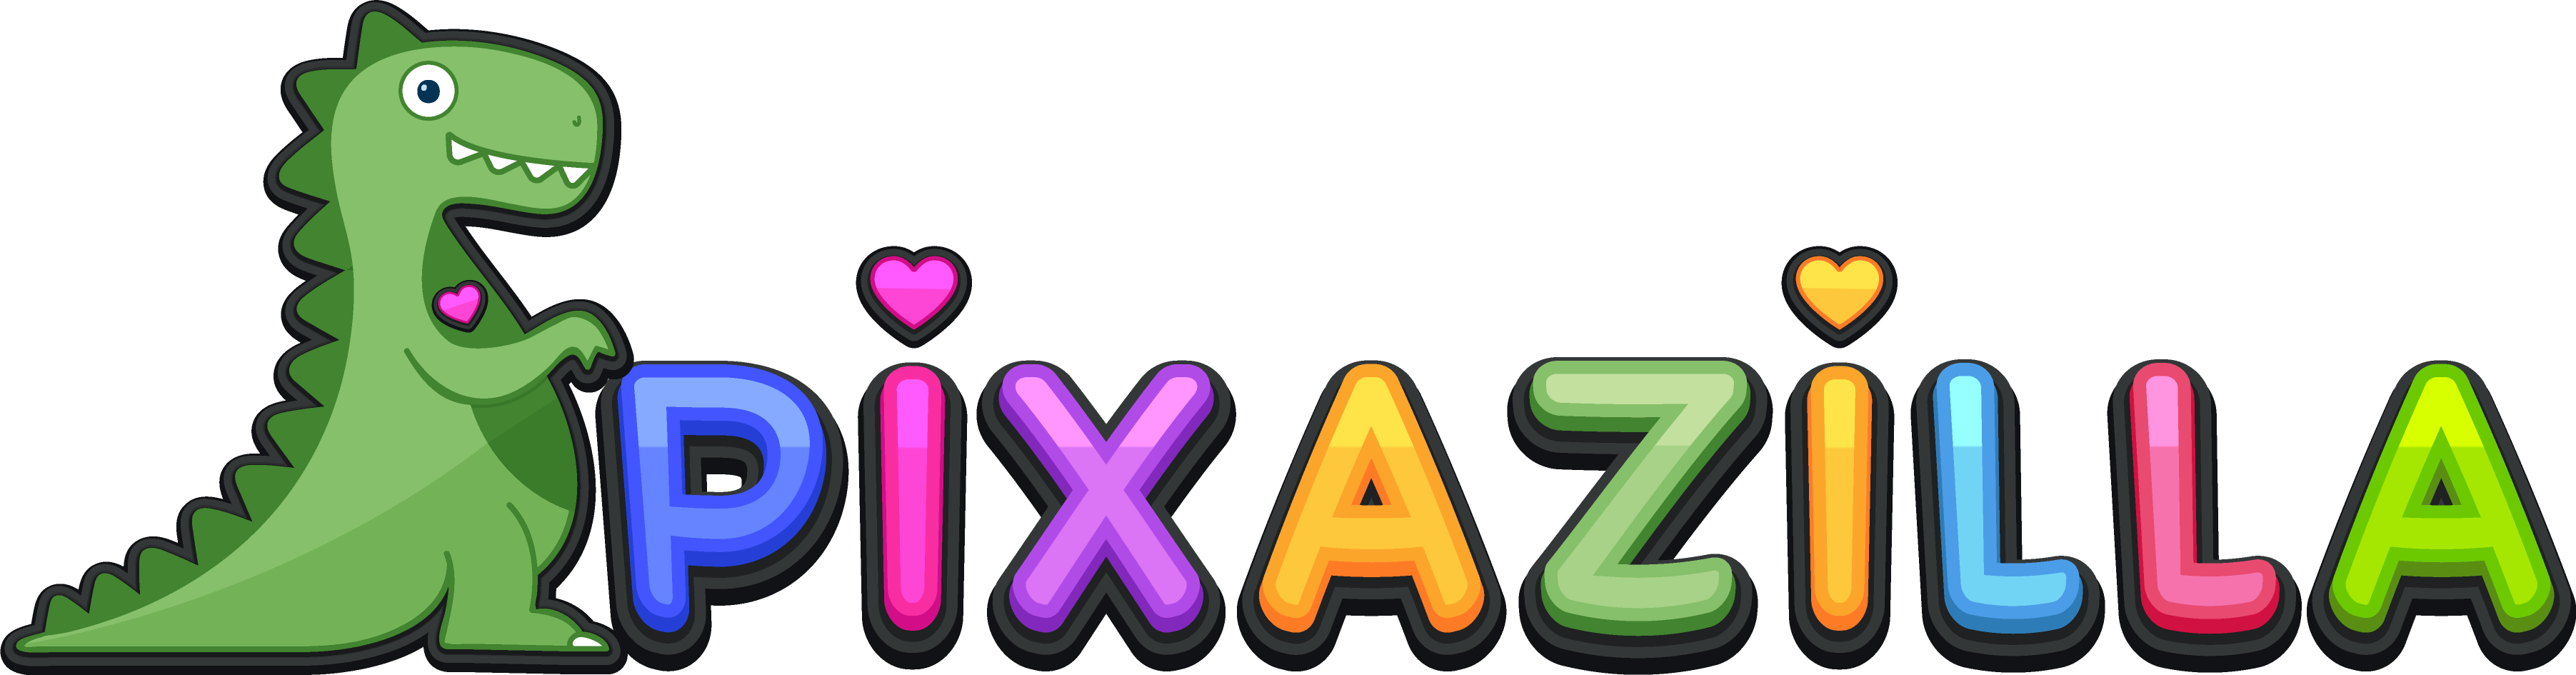 Pixazilla